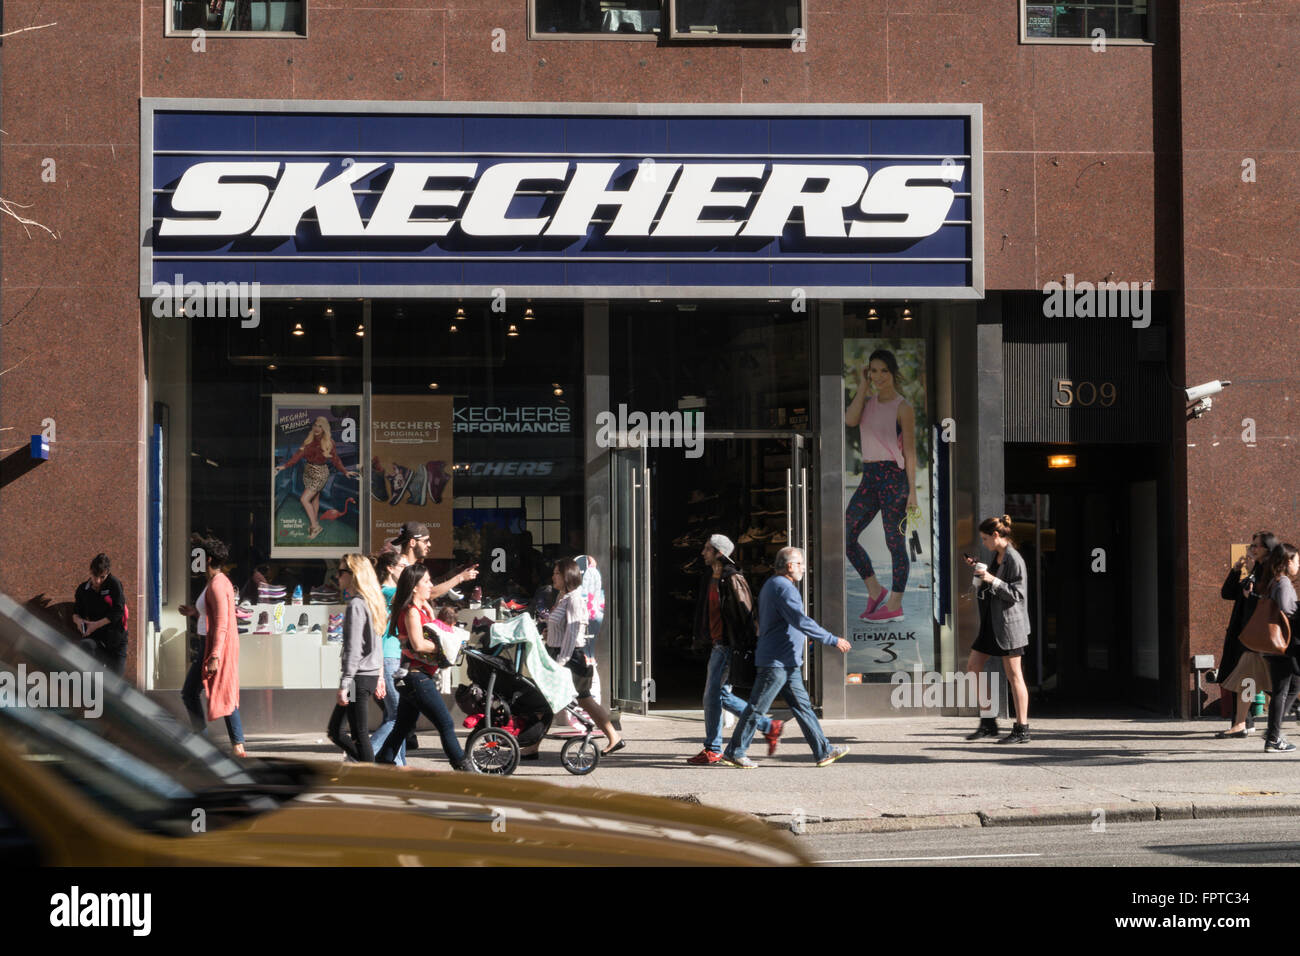 Skechers Shoe Store High Resolution